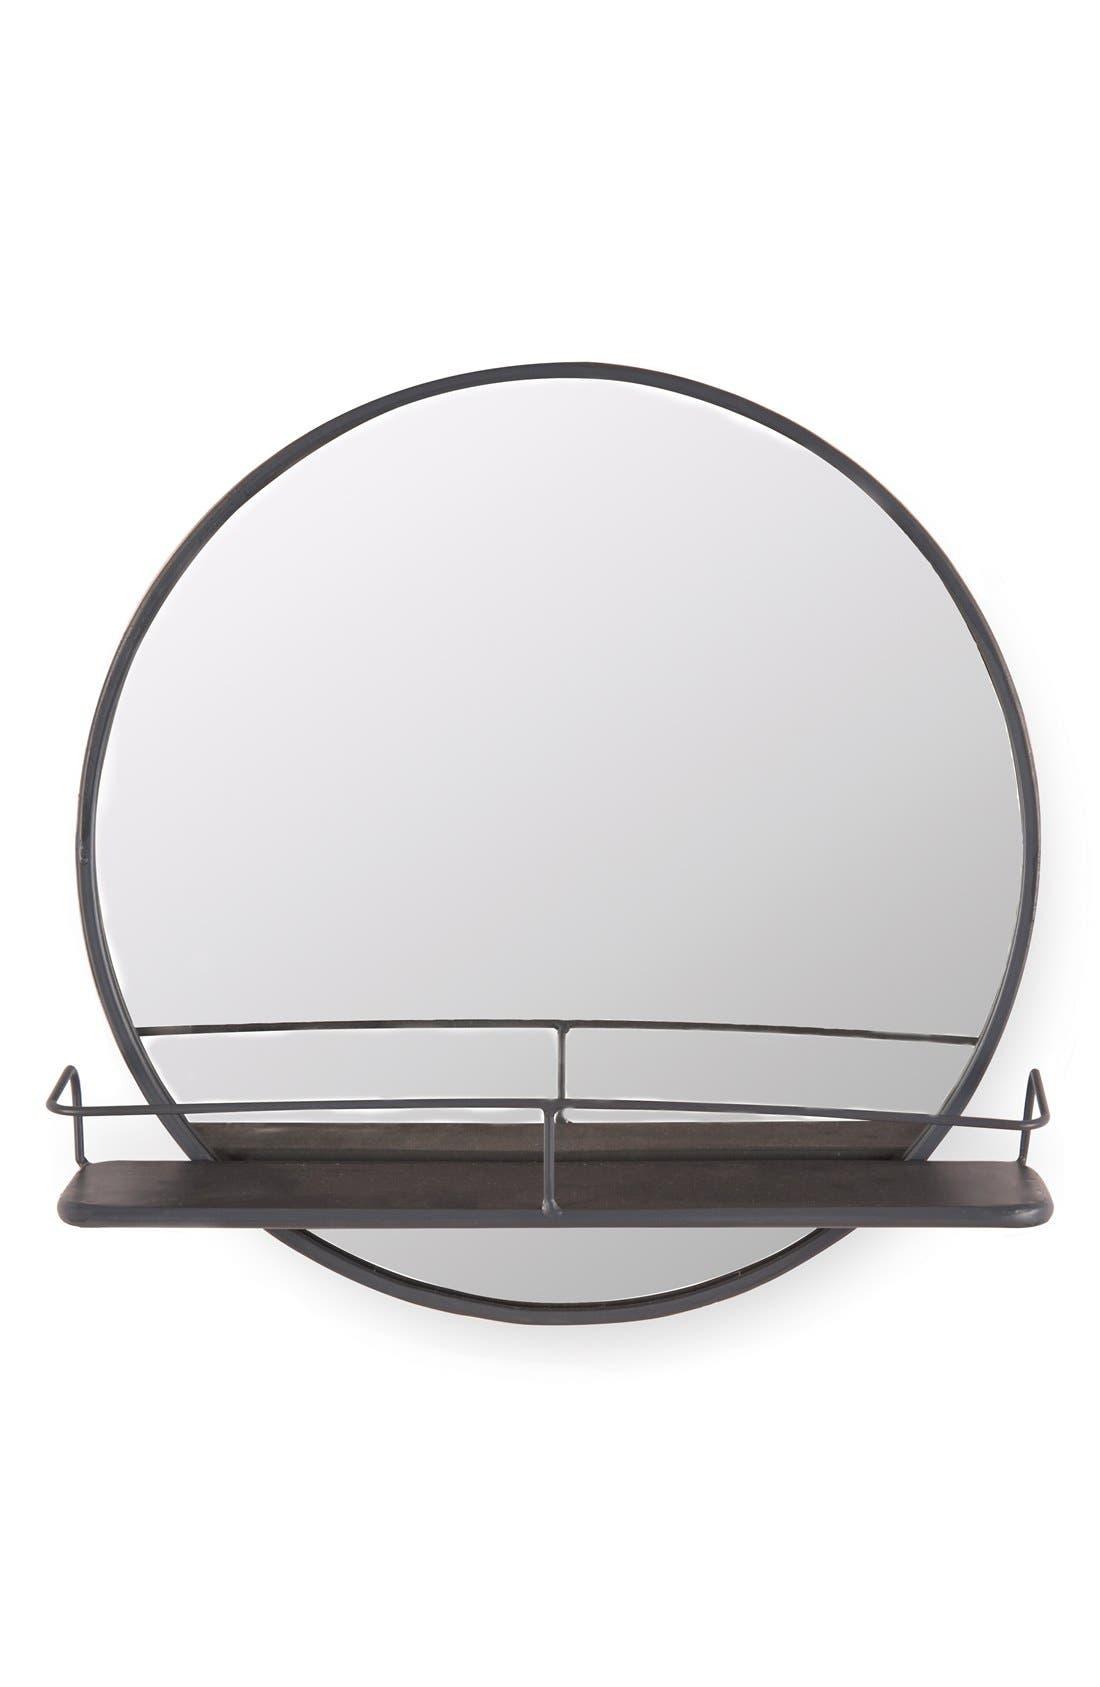 Main Image - Foreside Circle Shelf Mirror